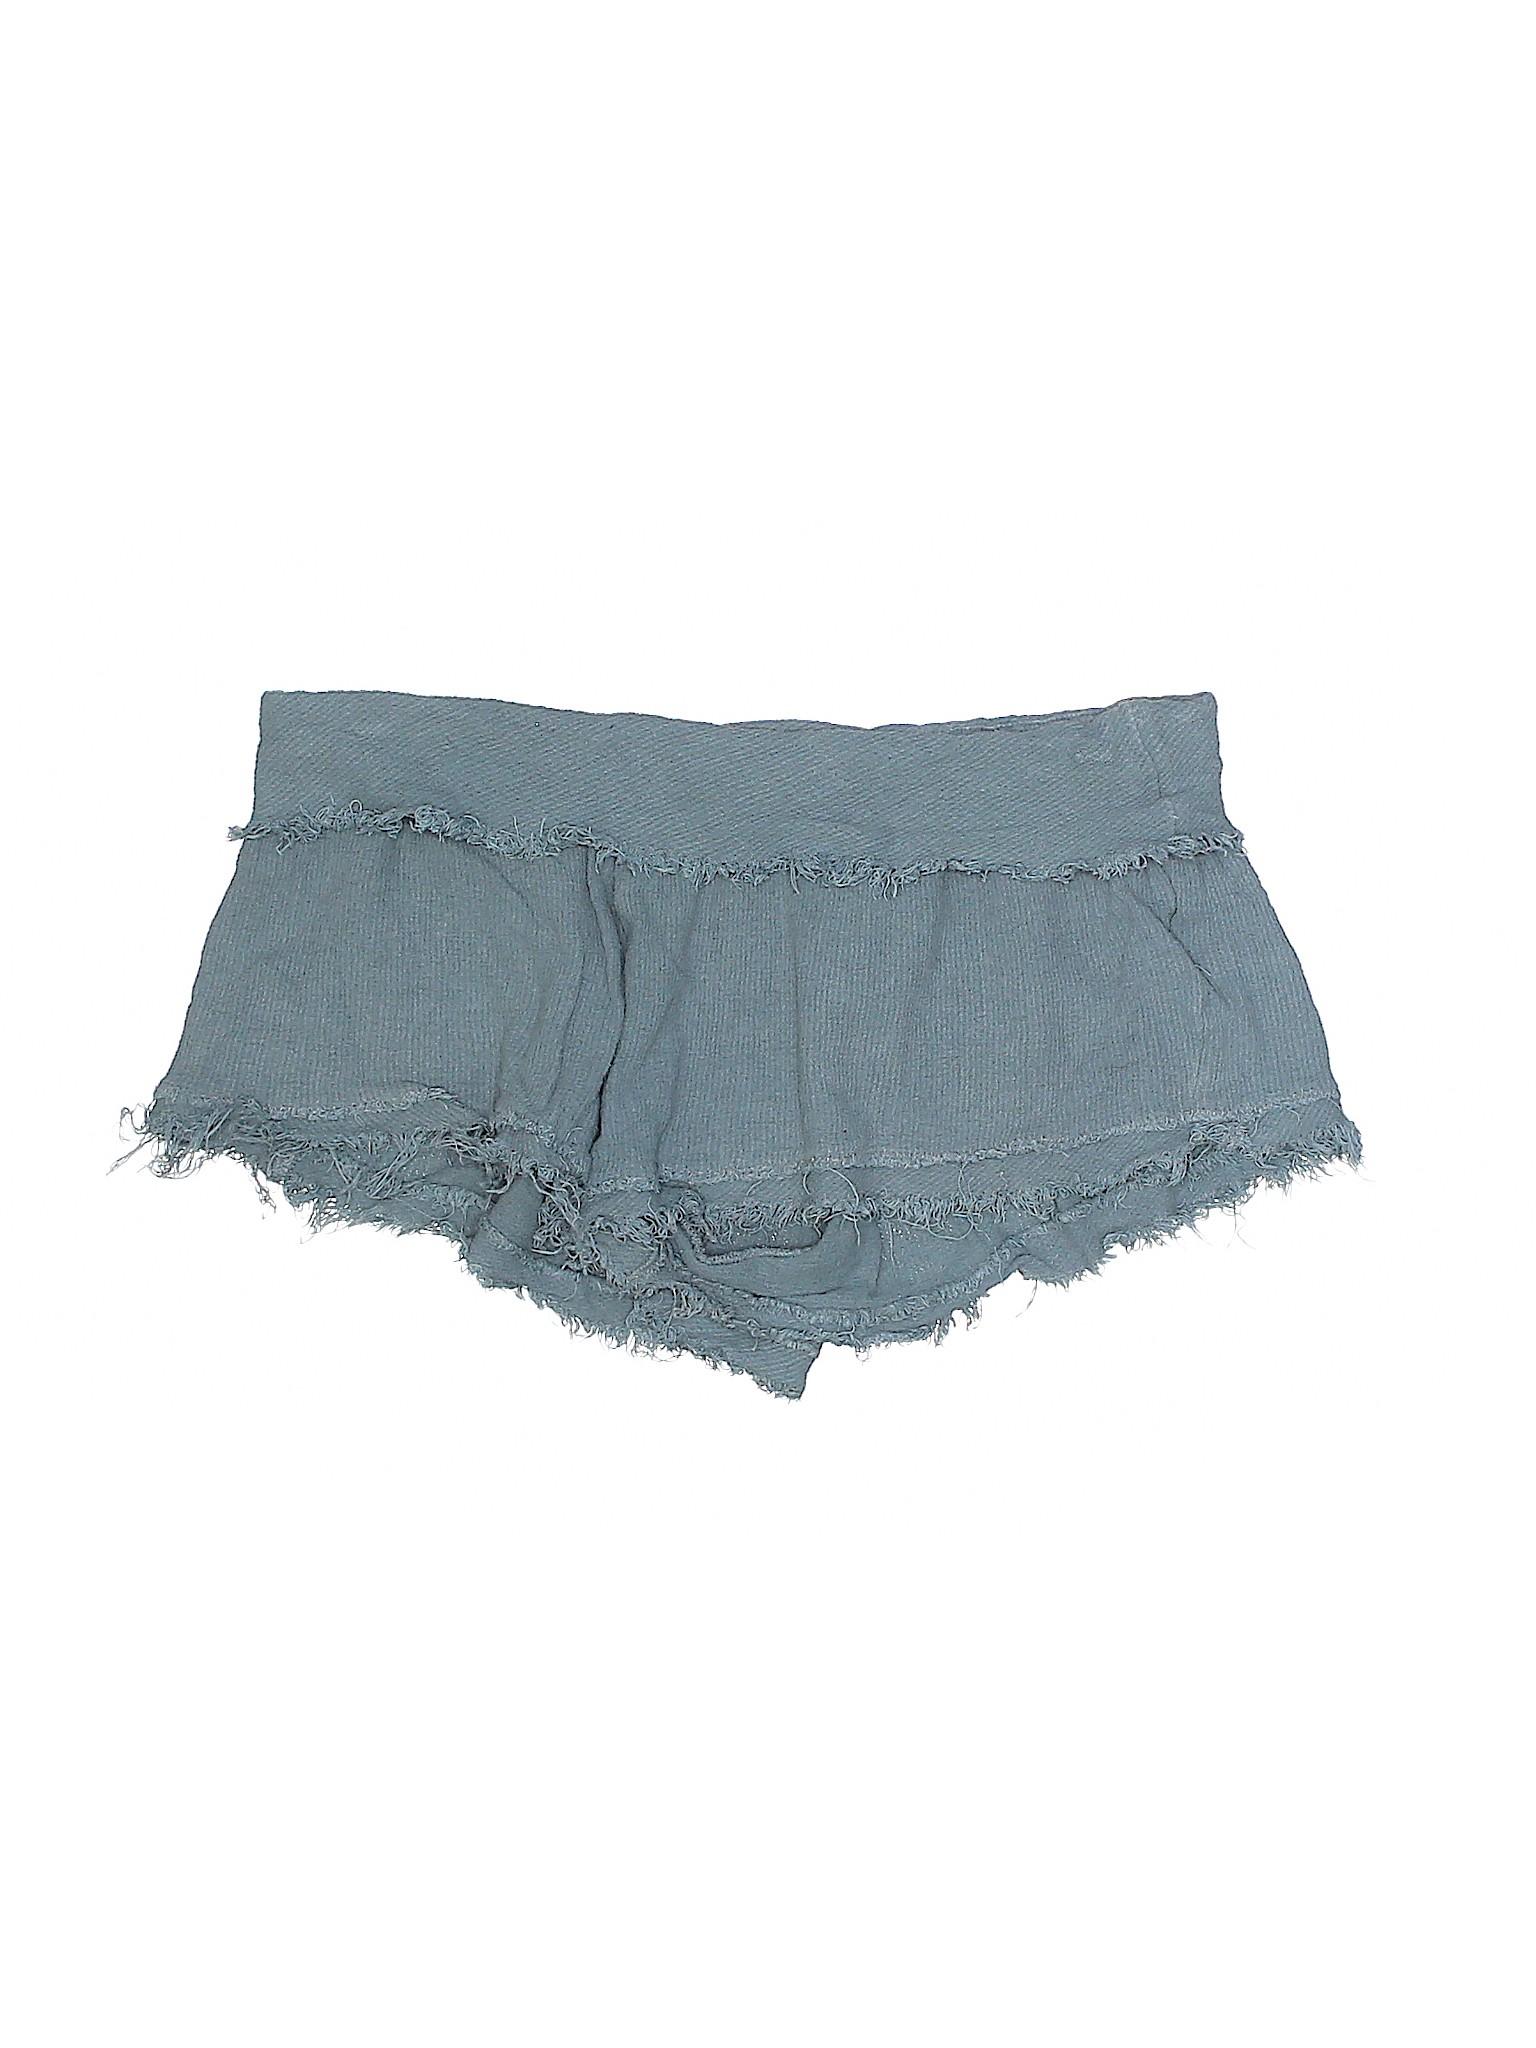 Boutique Shorts Ecote Boutique Shorts Shorts Shorts Boutique Ecote Ecote Ecote Ecote Shorts Shorts Ecote Boutique Boutique Boutique TxdHA8x